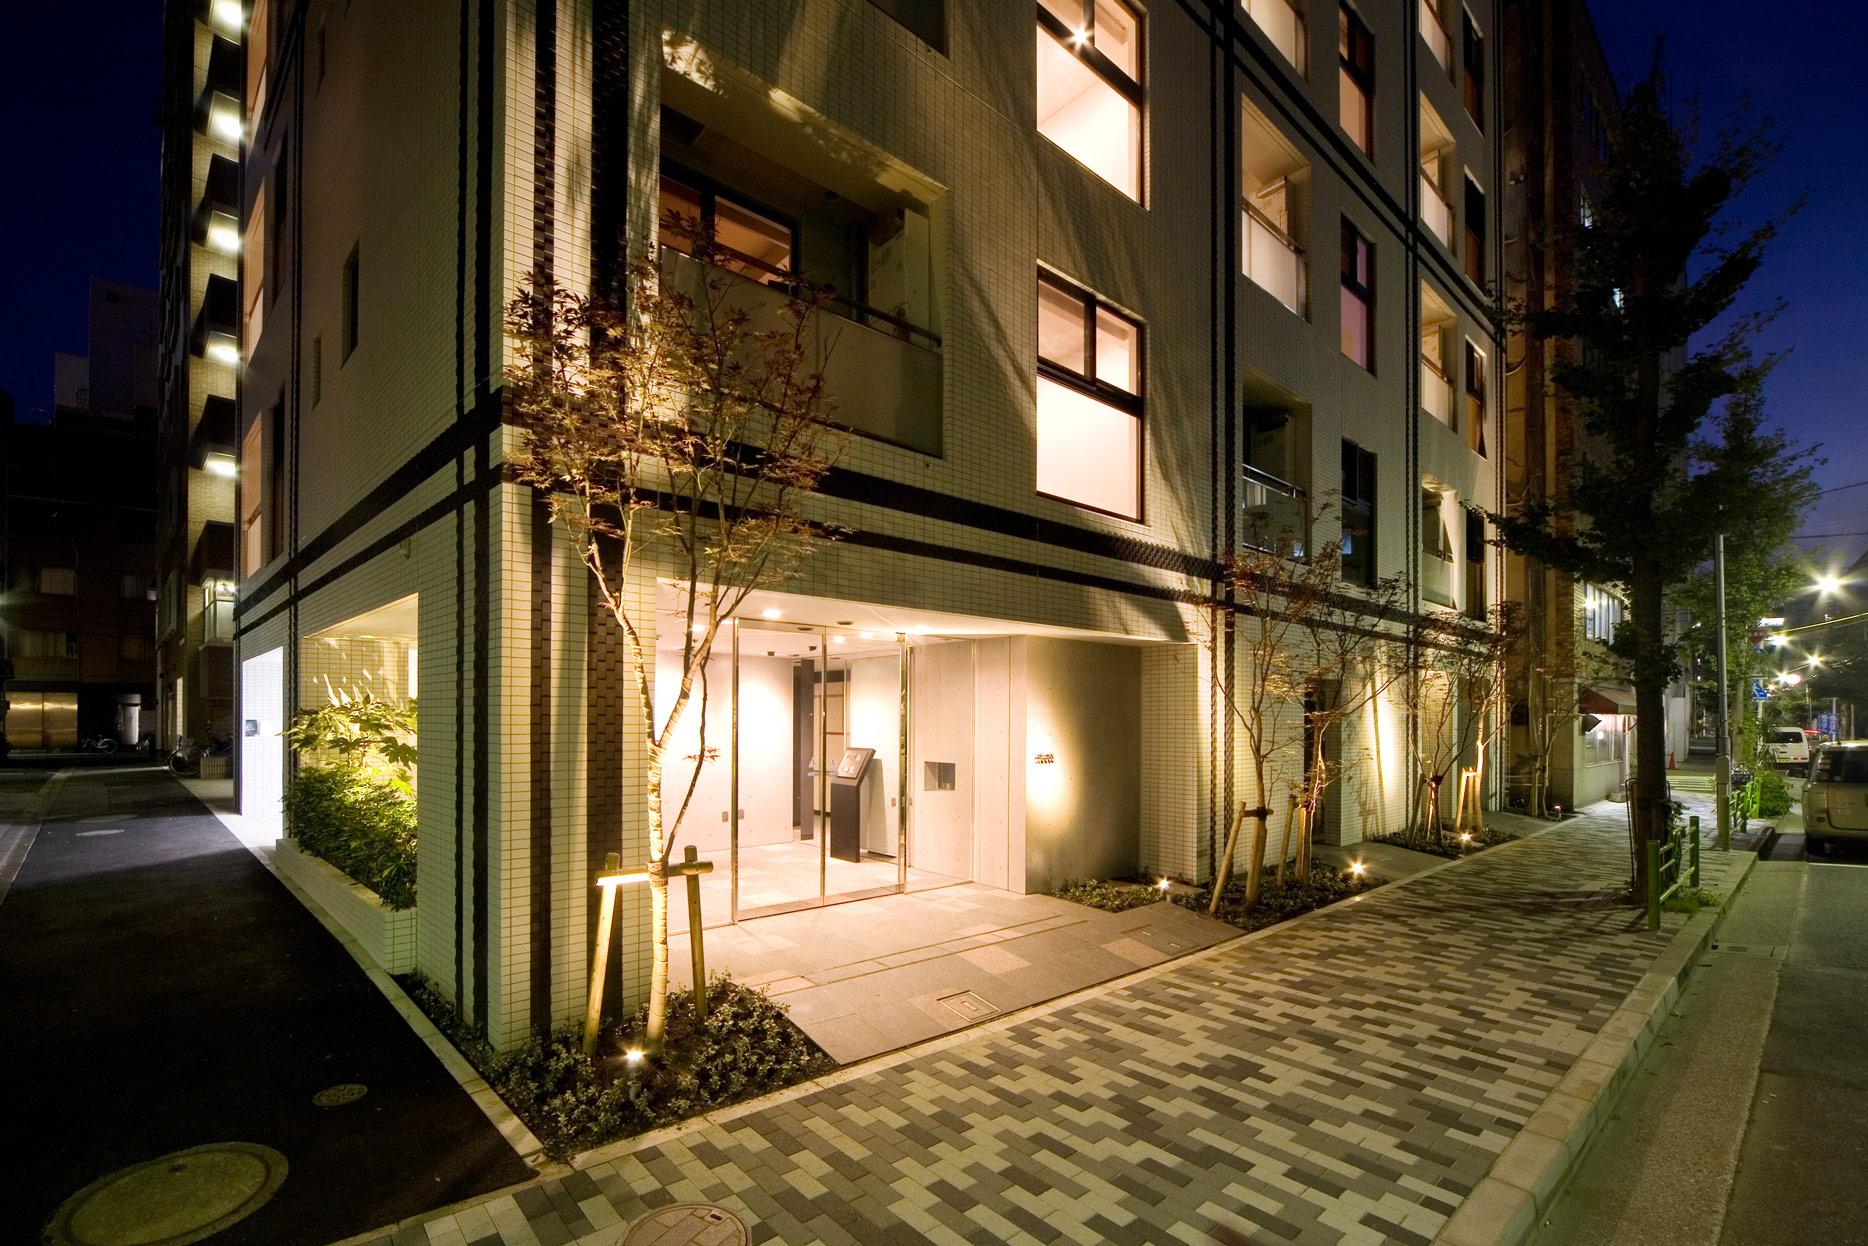 GREEN PARK 日本橋蛎殻町 | マンションギャラリー